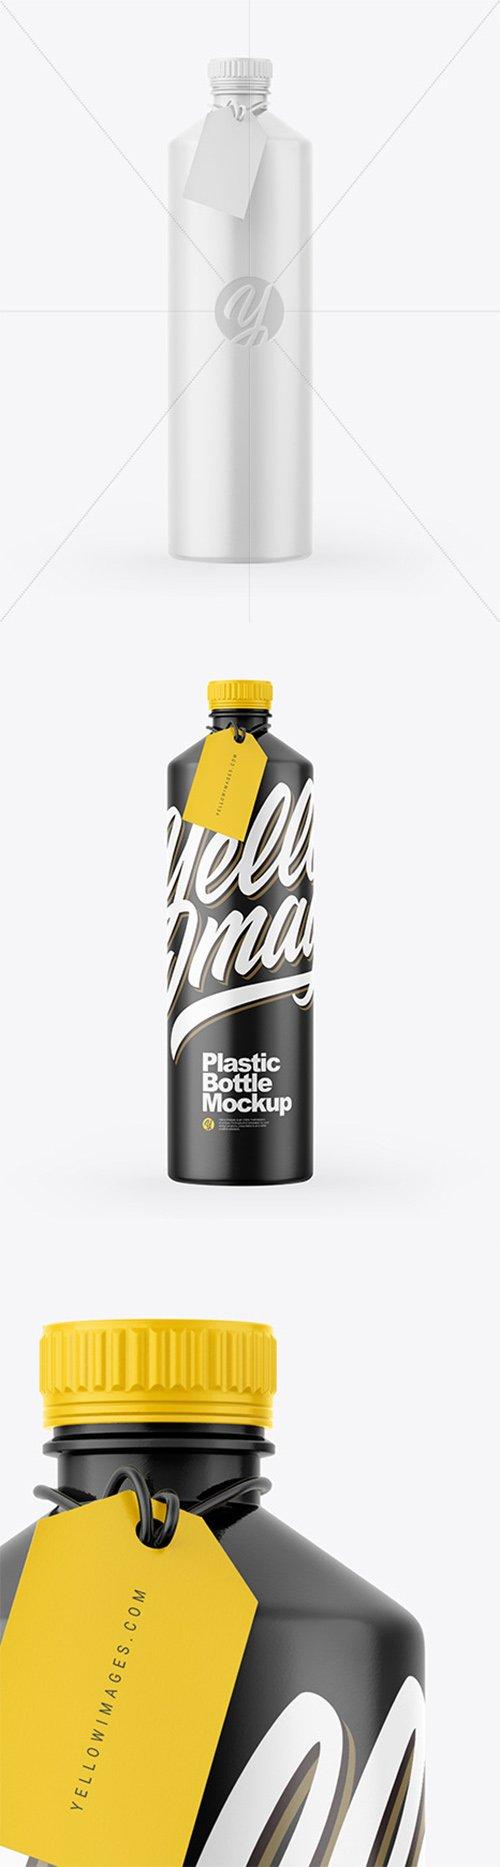 Glossy Plastic Bottle Mockup 64552